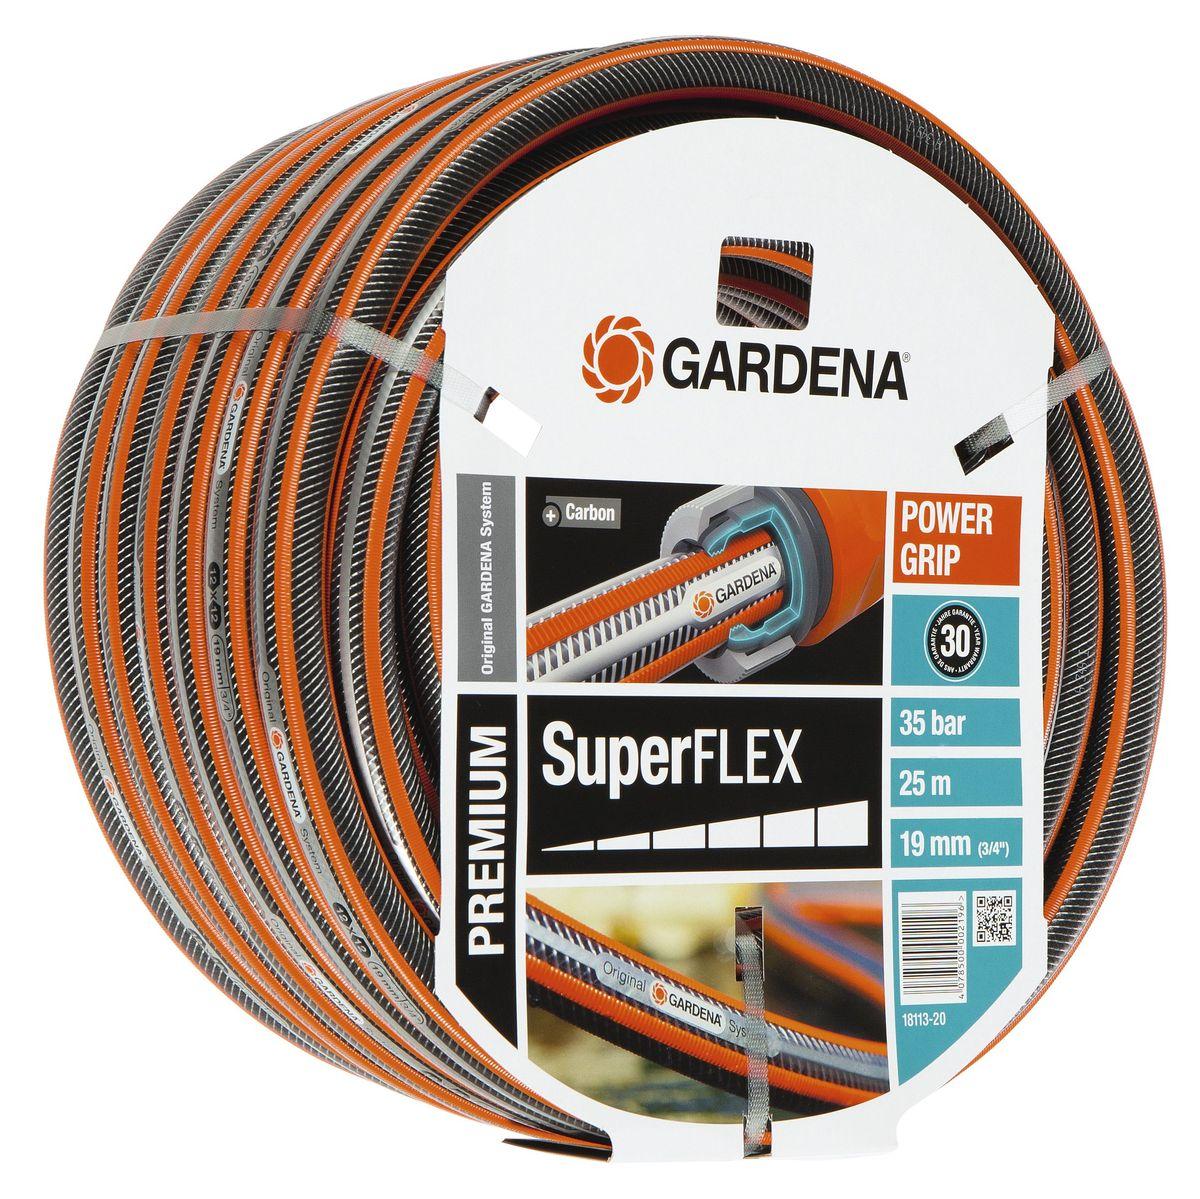 Шланг Gardena Superflex, диаметр 3/4, длина 25 м шланг gardena superflex